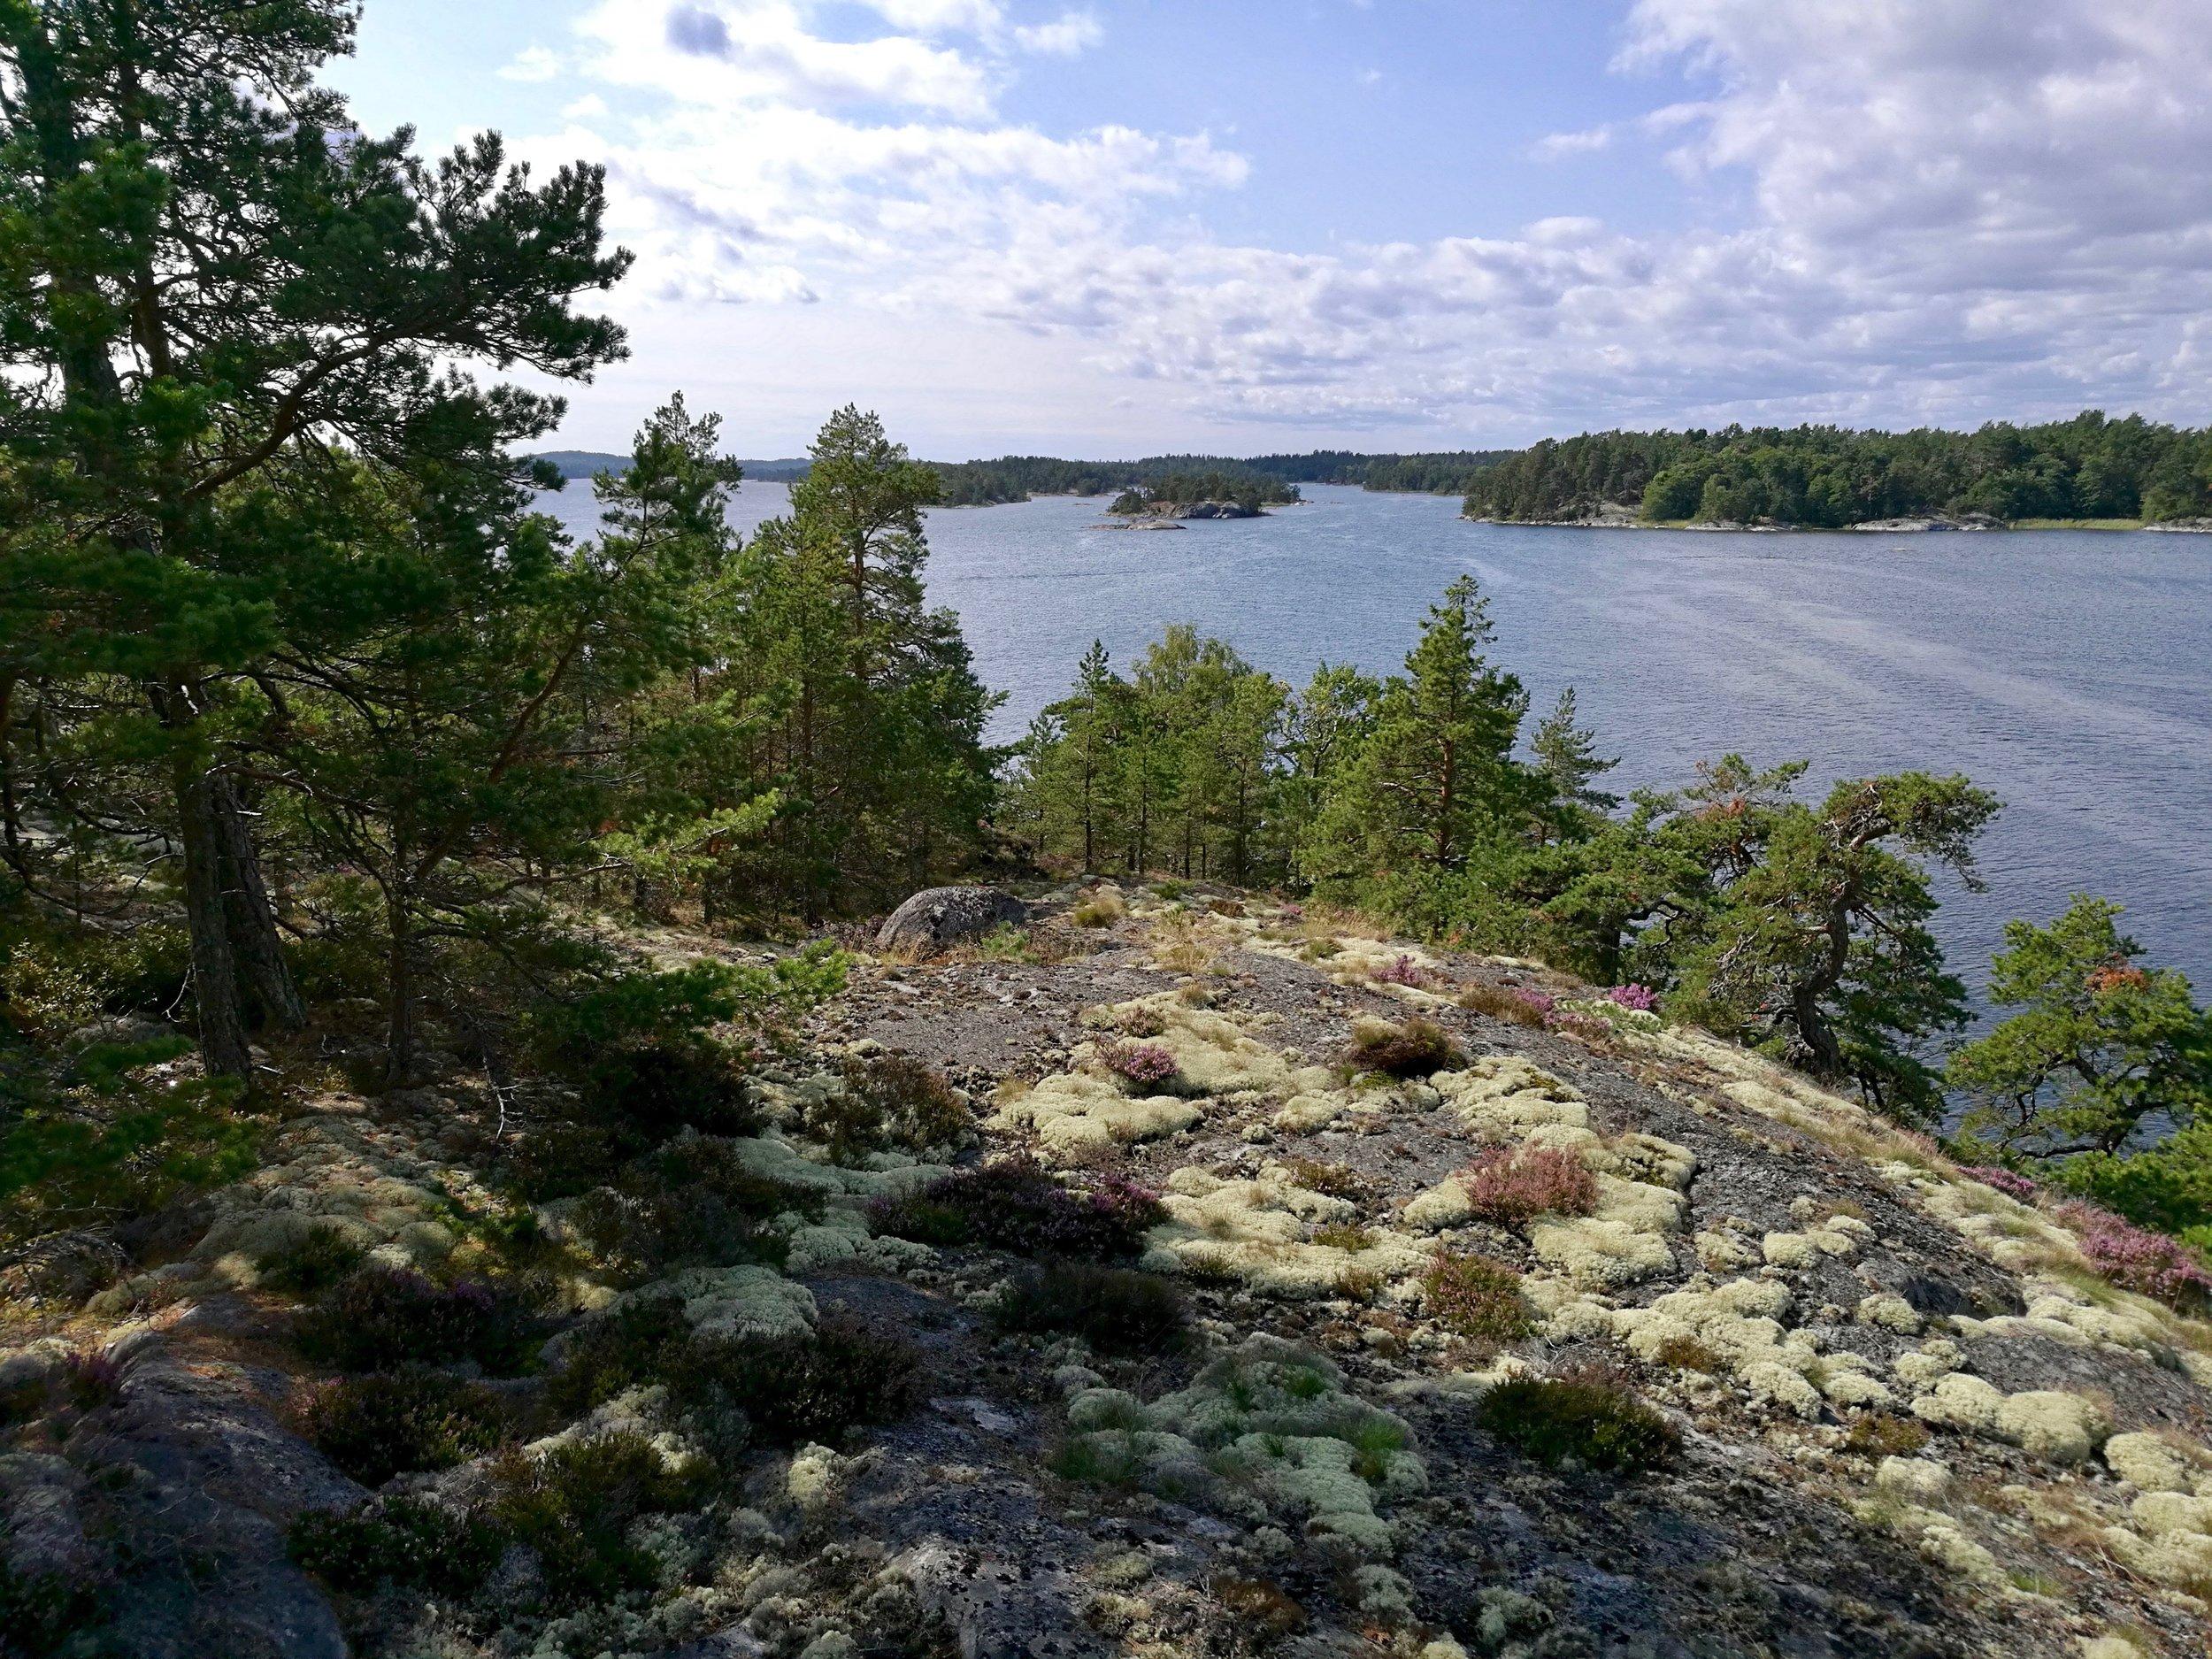 Stockholm Archipelago Kayaking 1 day 9